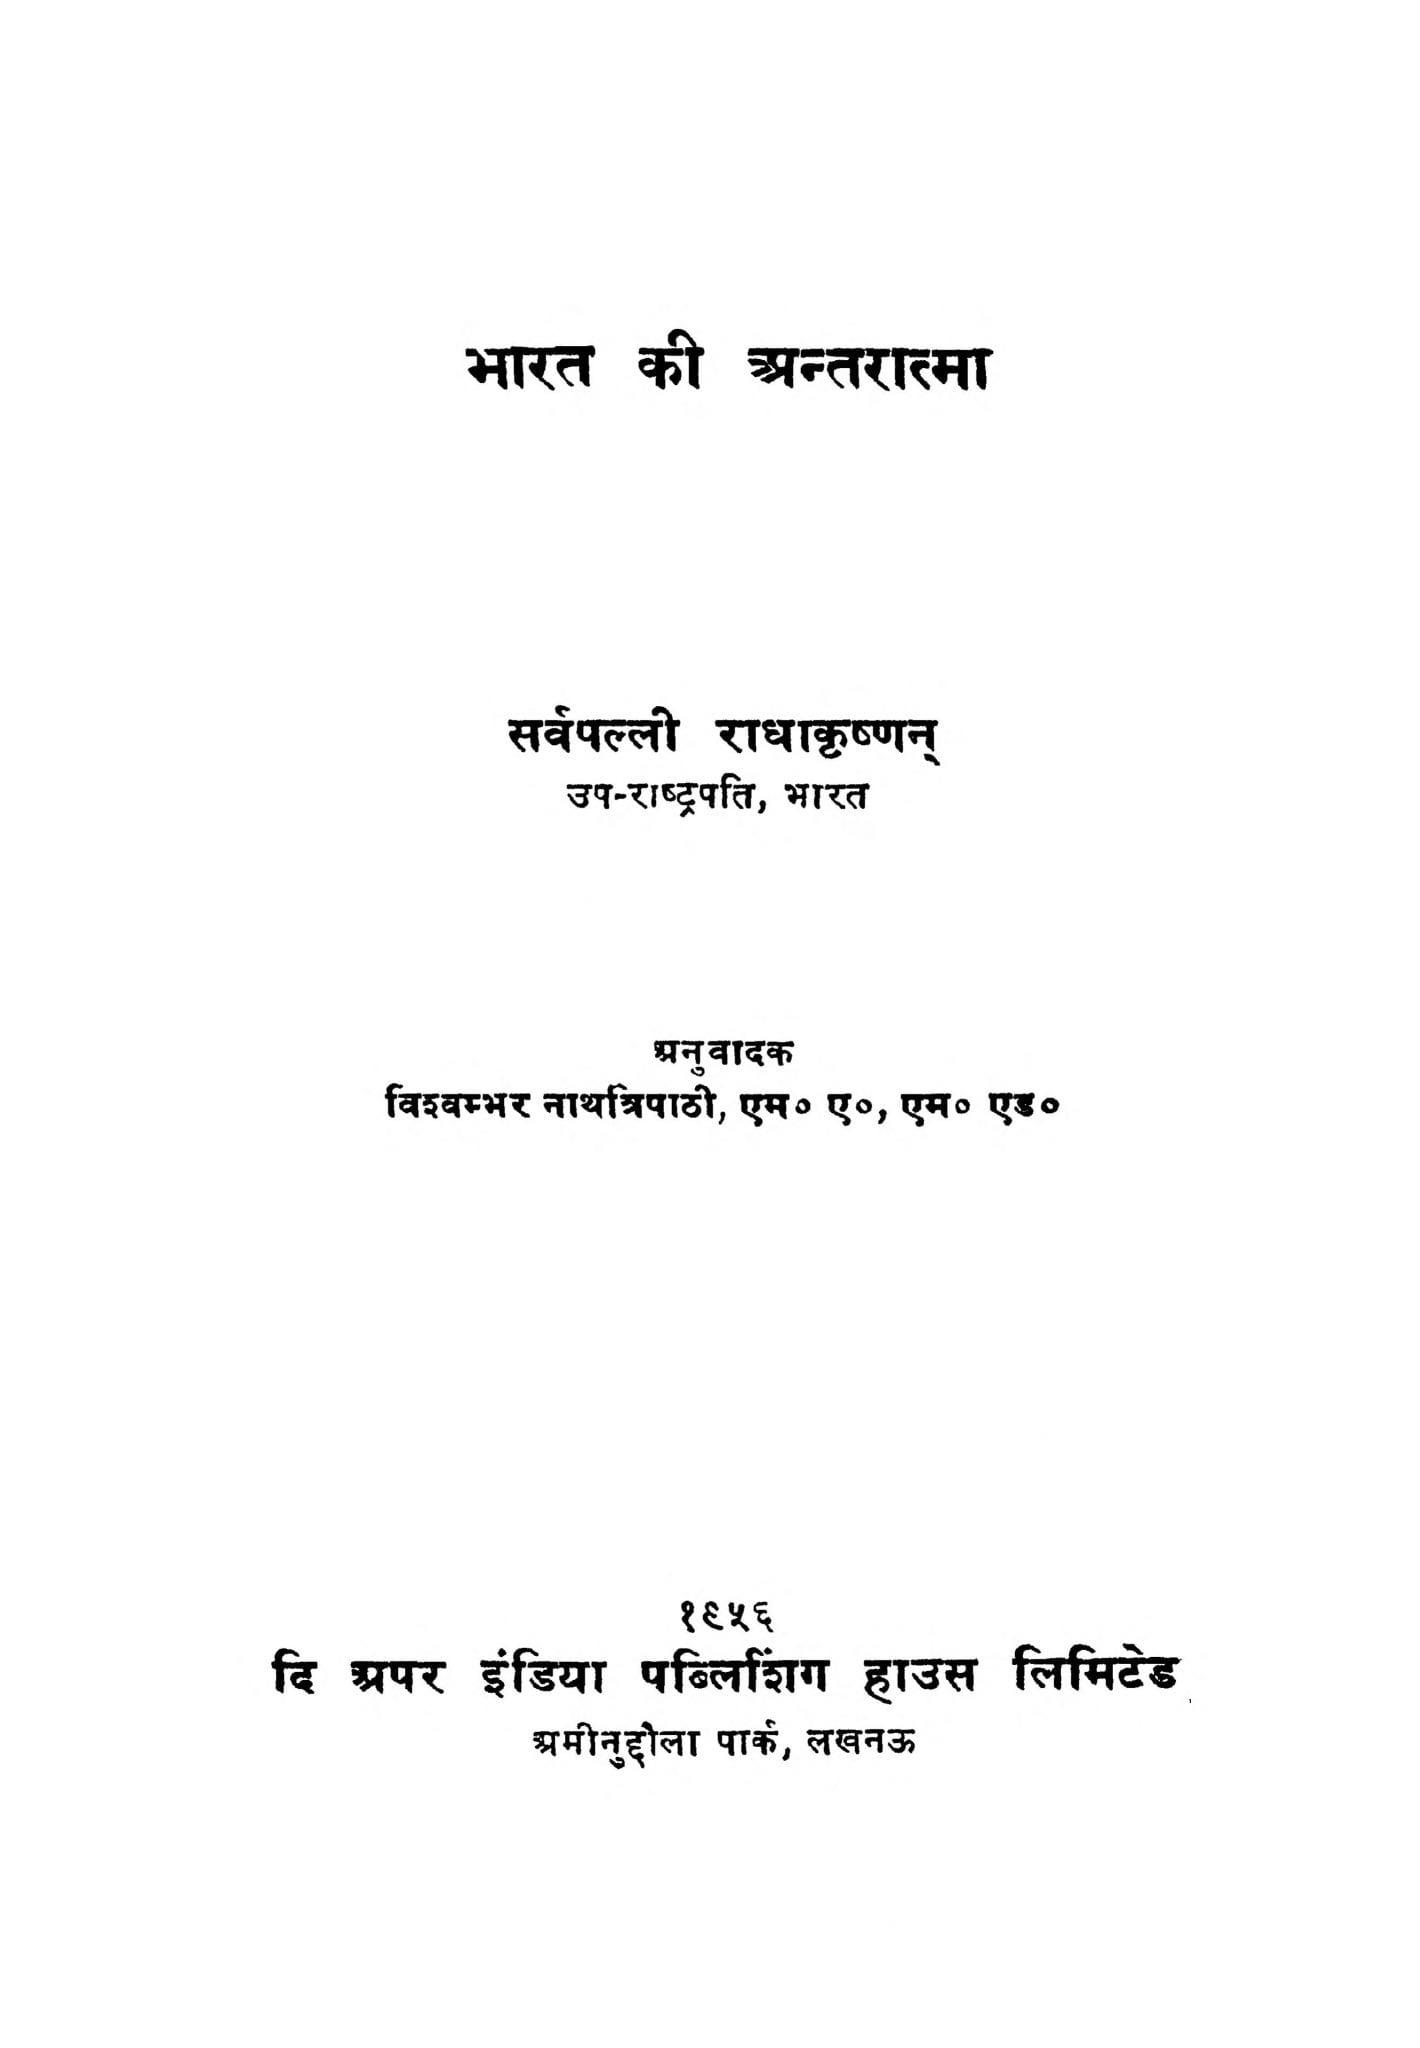 Book Image : भारत की अंतरात्मा - Bharat Ki Antaratma